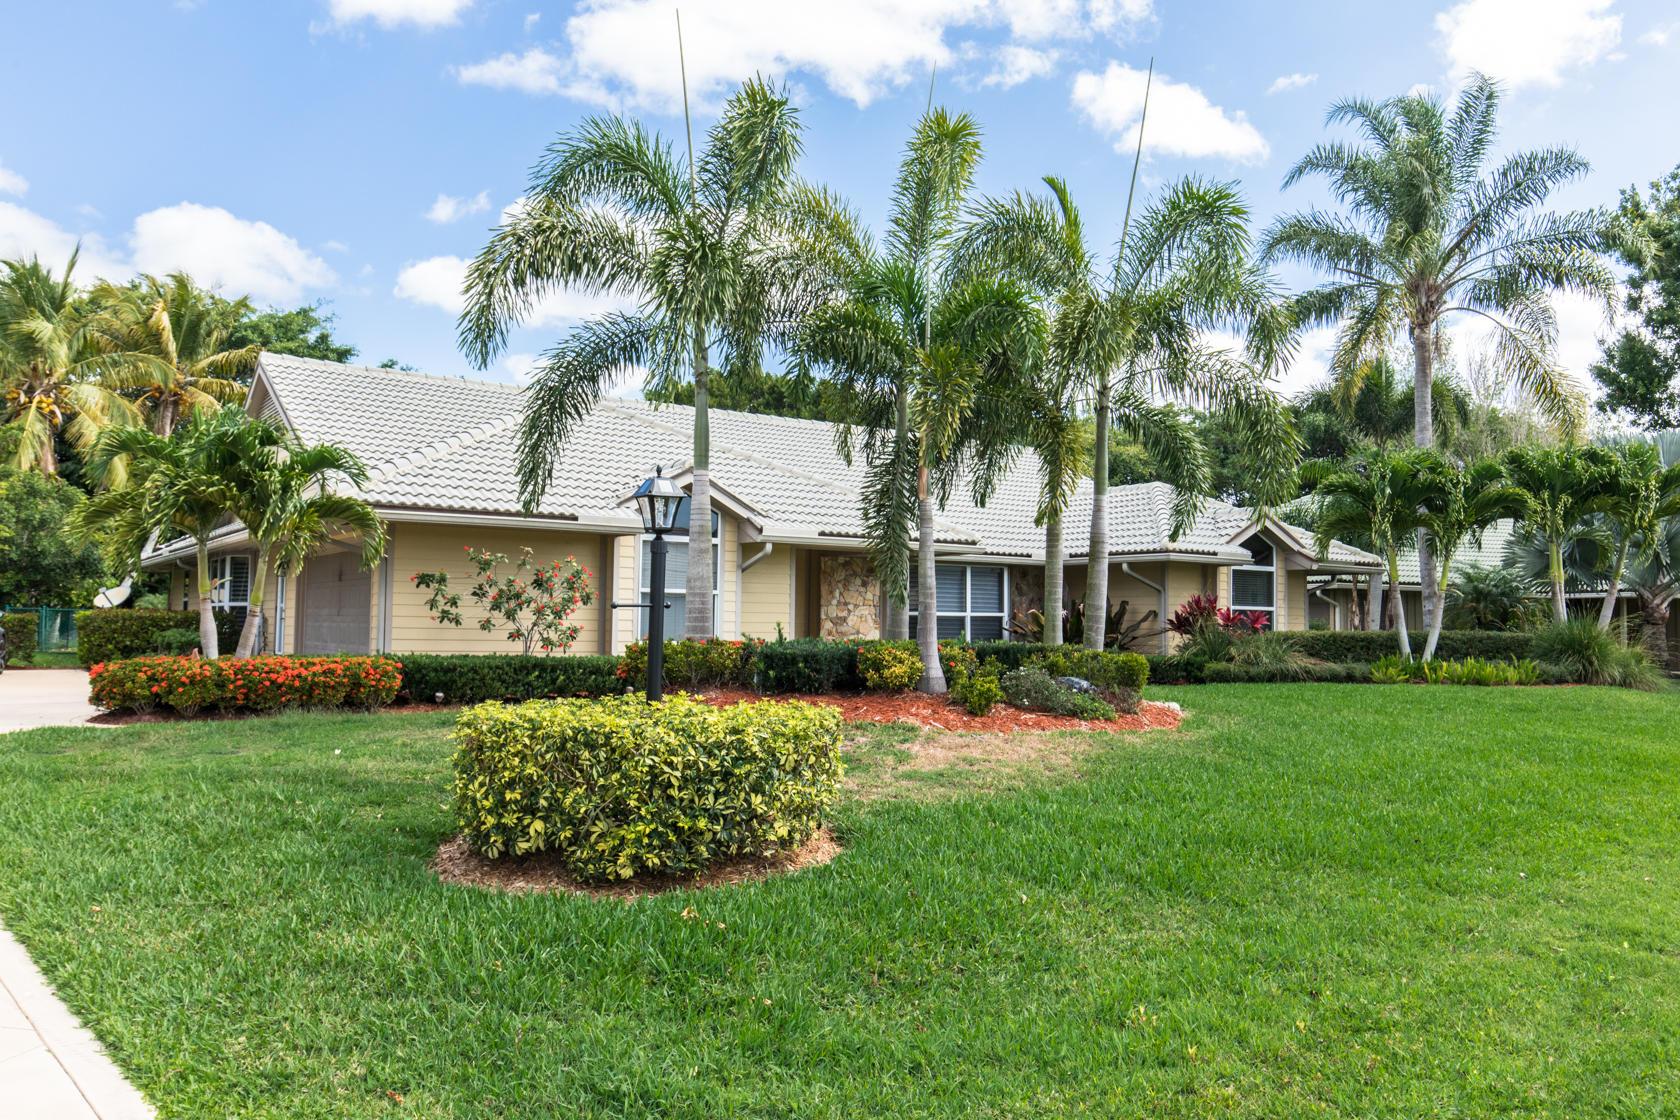 14 Dunbar Road, Palm Beach Gardens, Florida 33418, 4 Bedrooms Bedrooms, ,2.1 BathroomsBathrooms,A,Single family,Dunbar,RX-10711840